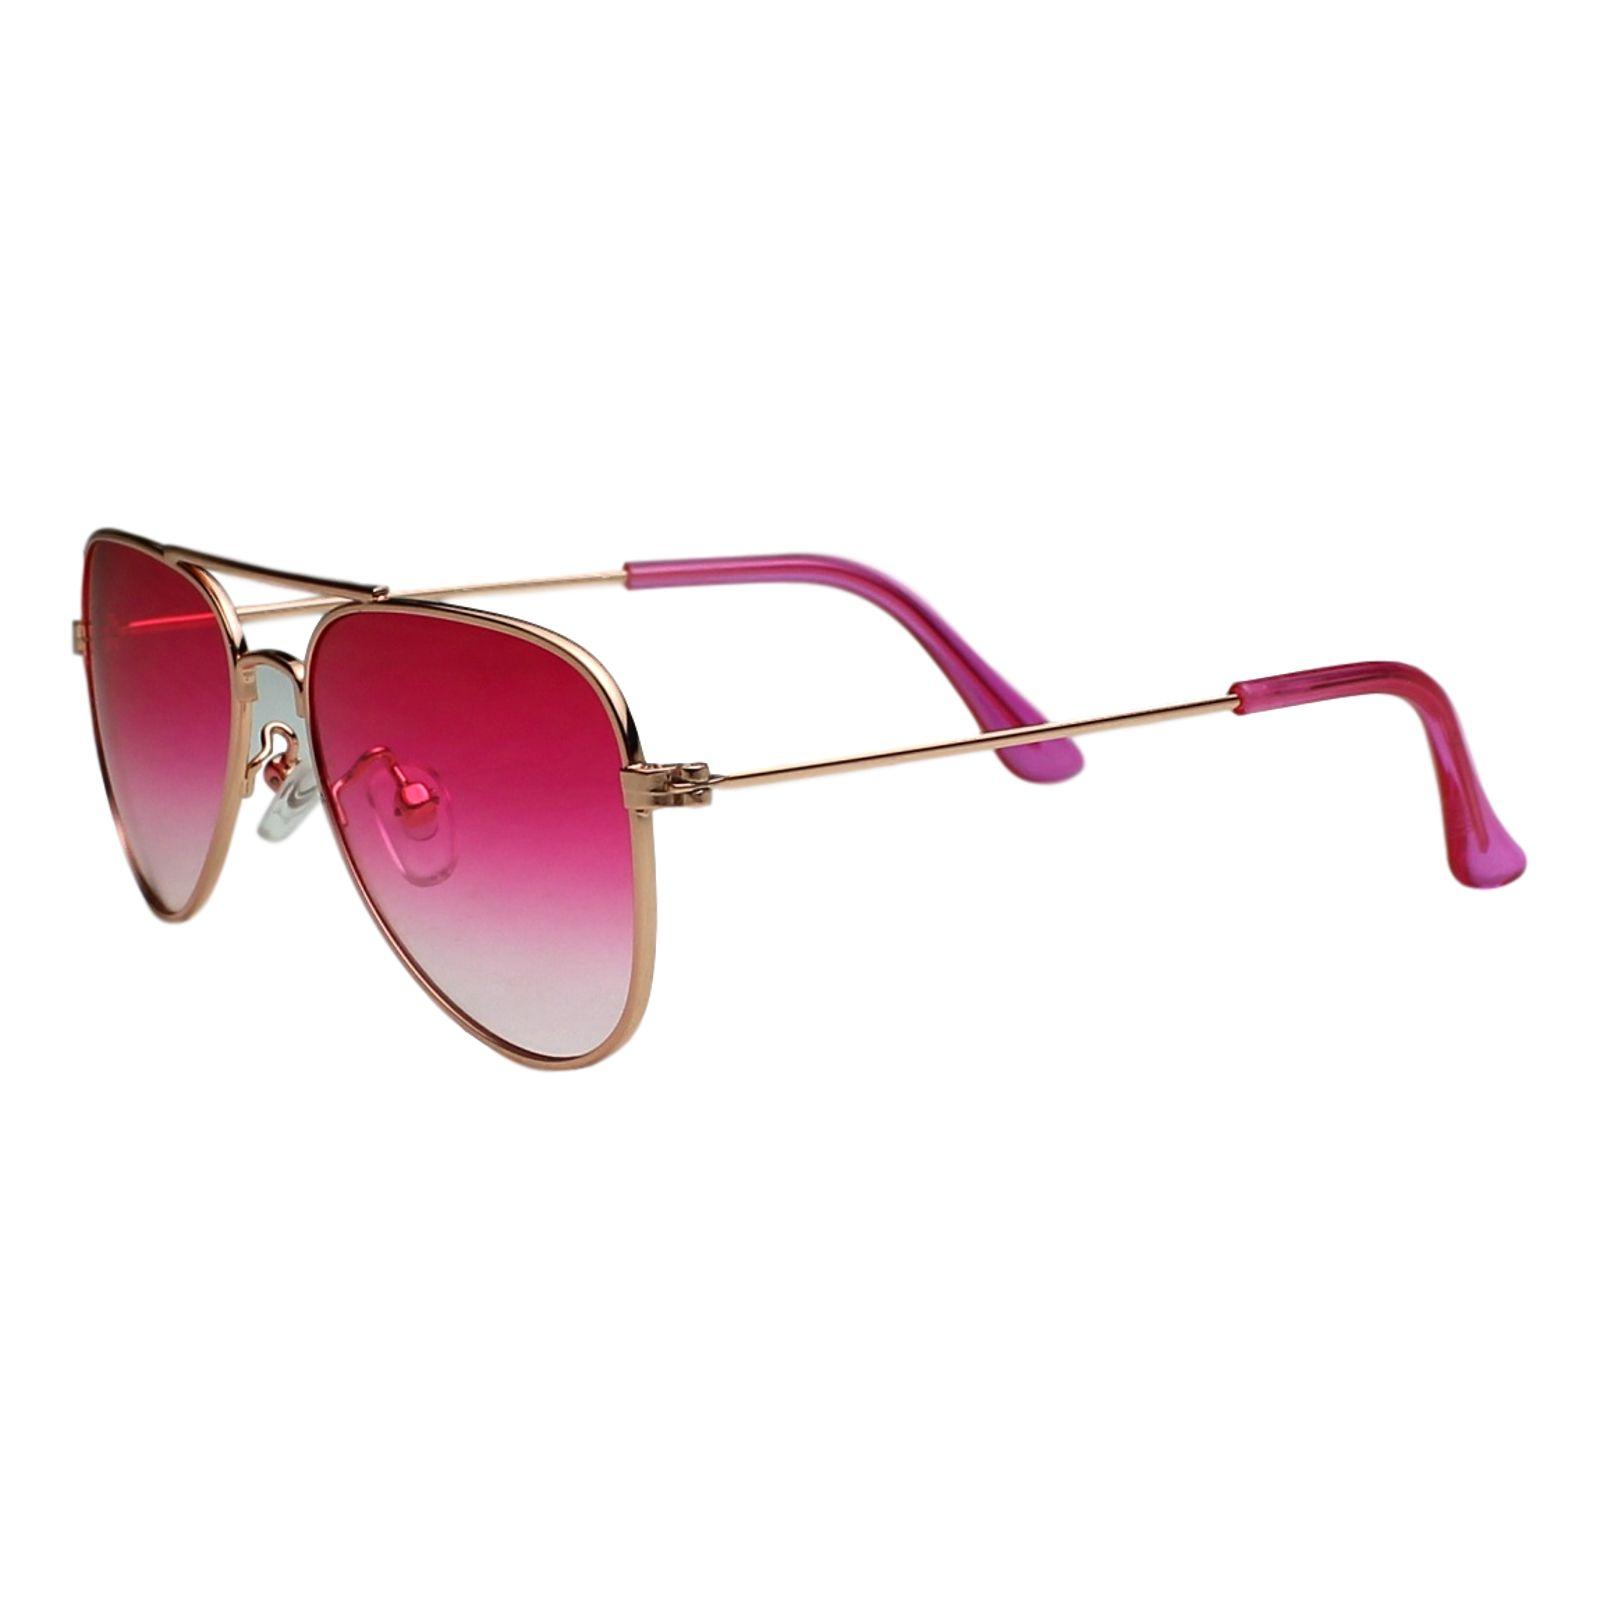 Óculos de Sol Díspar ID1902 infantil idade 3 a 6 anos - Díspar Style ... 484e3de97d